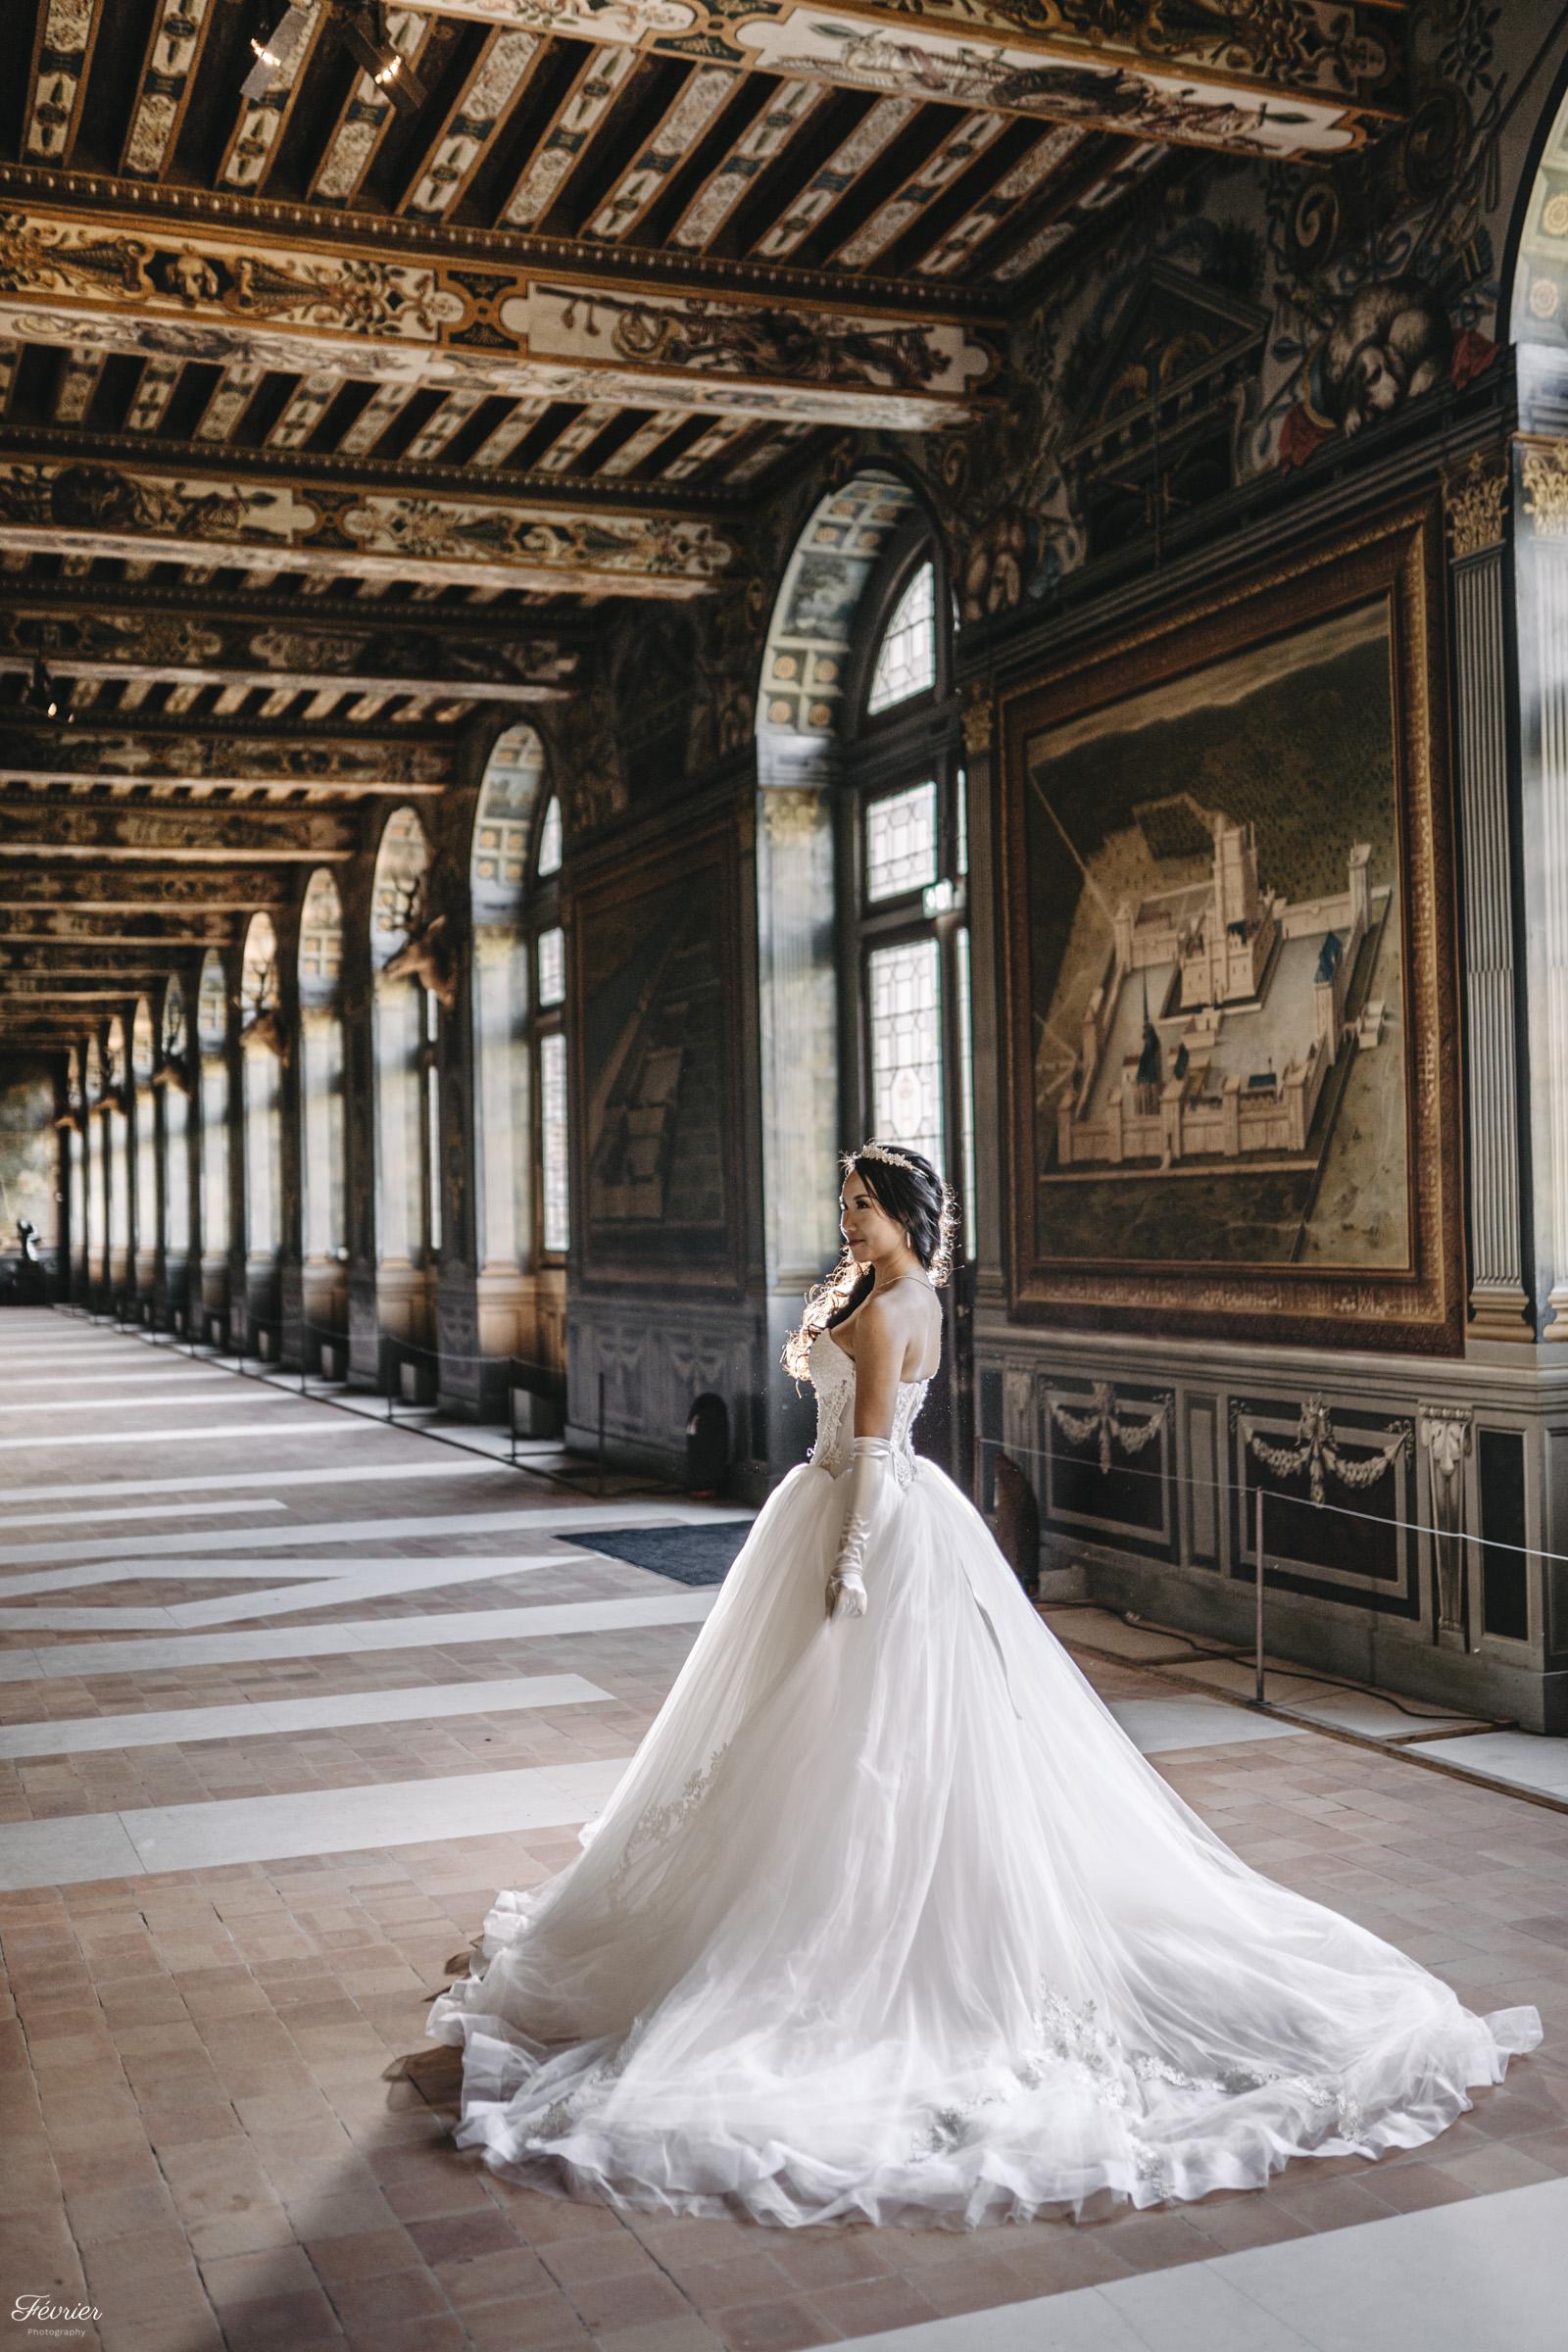 pre-wedding-hk-beautiful-bride-in-chateau-de-fontainebleau-paris